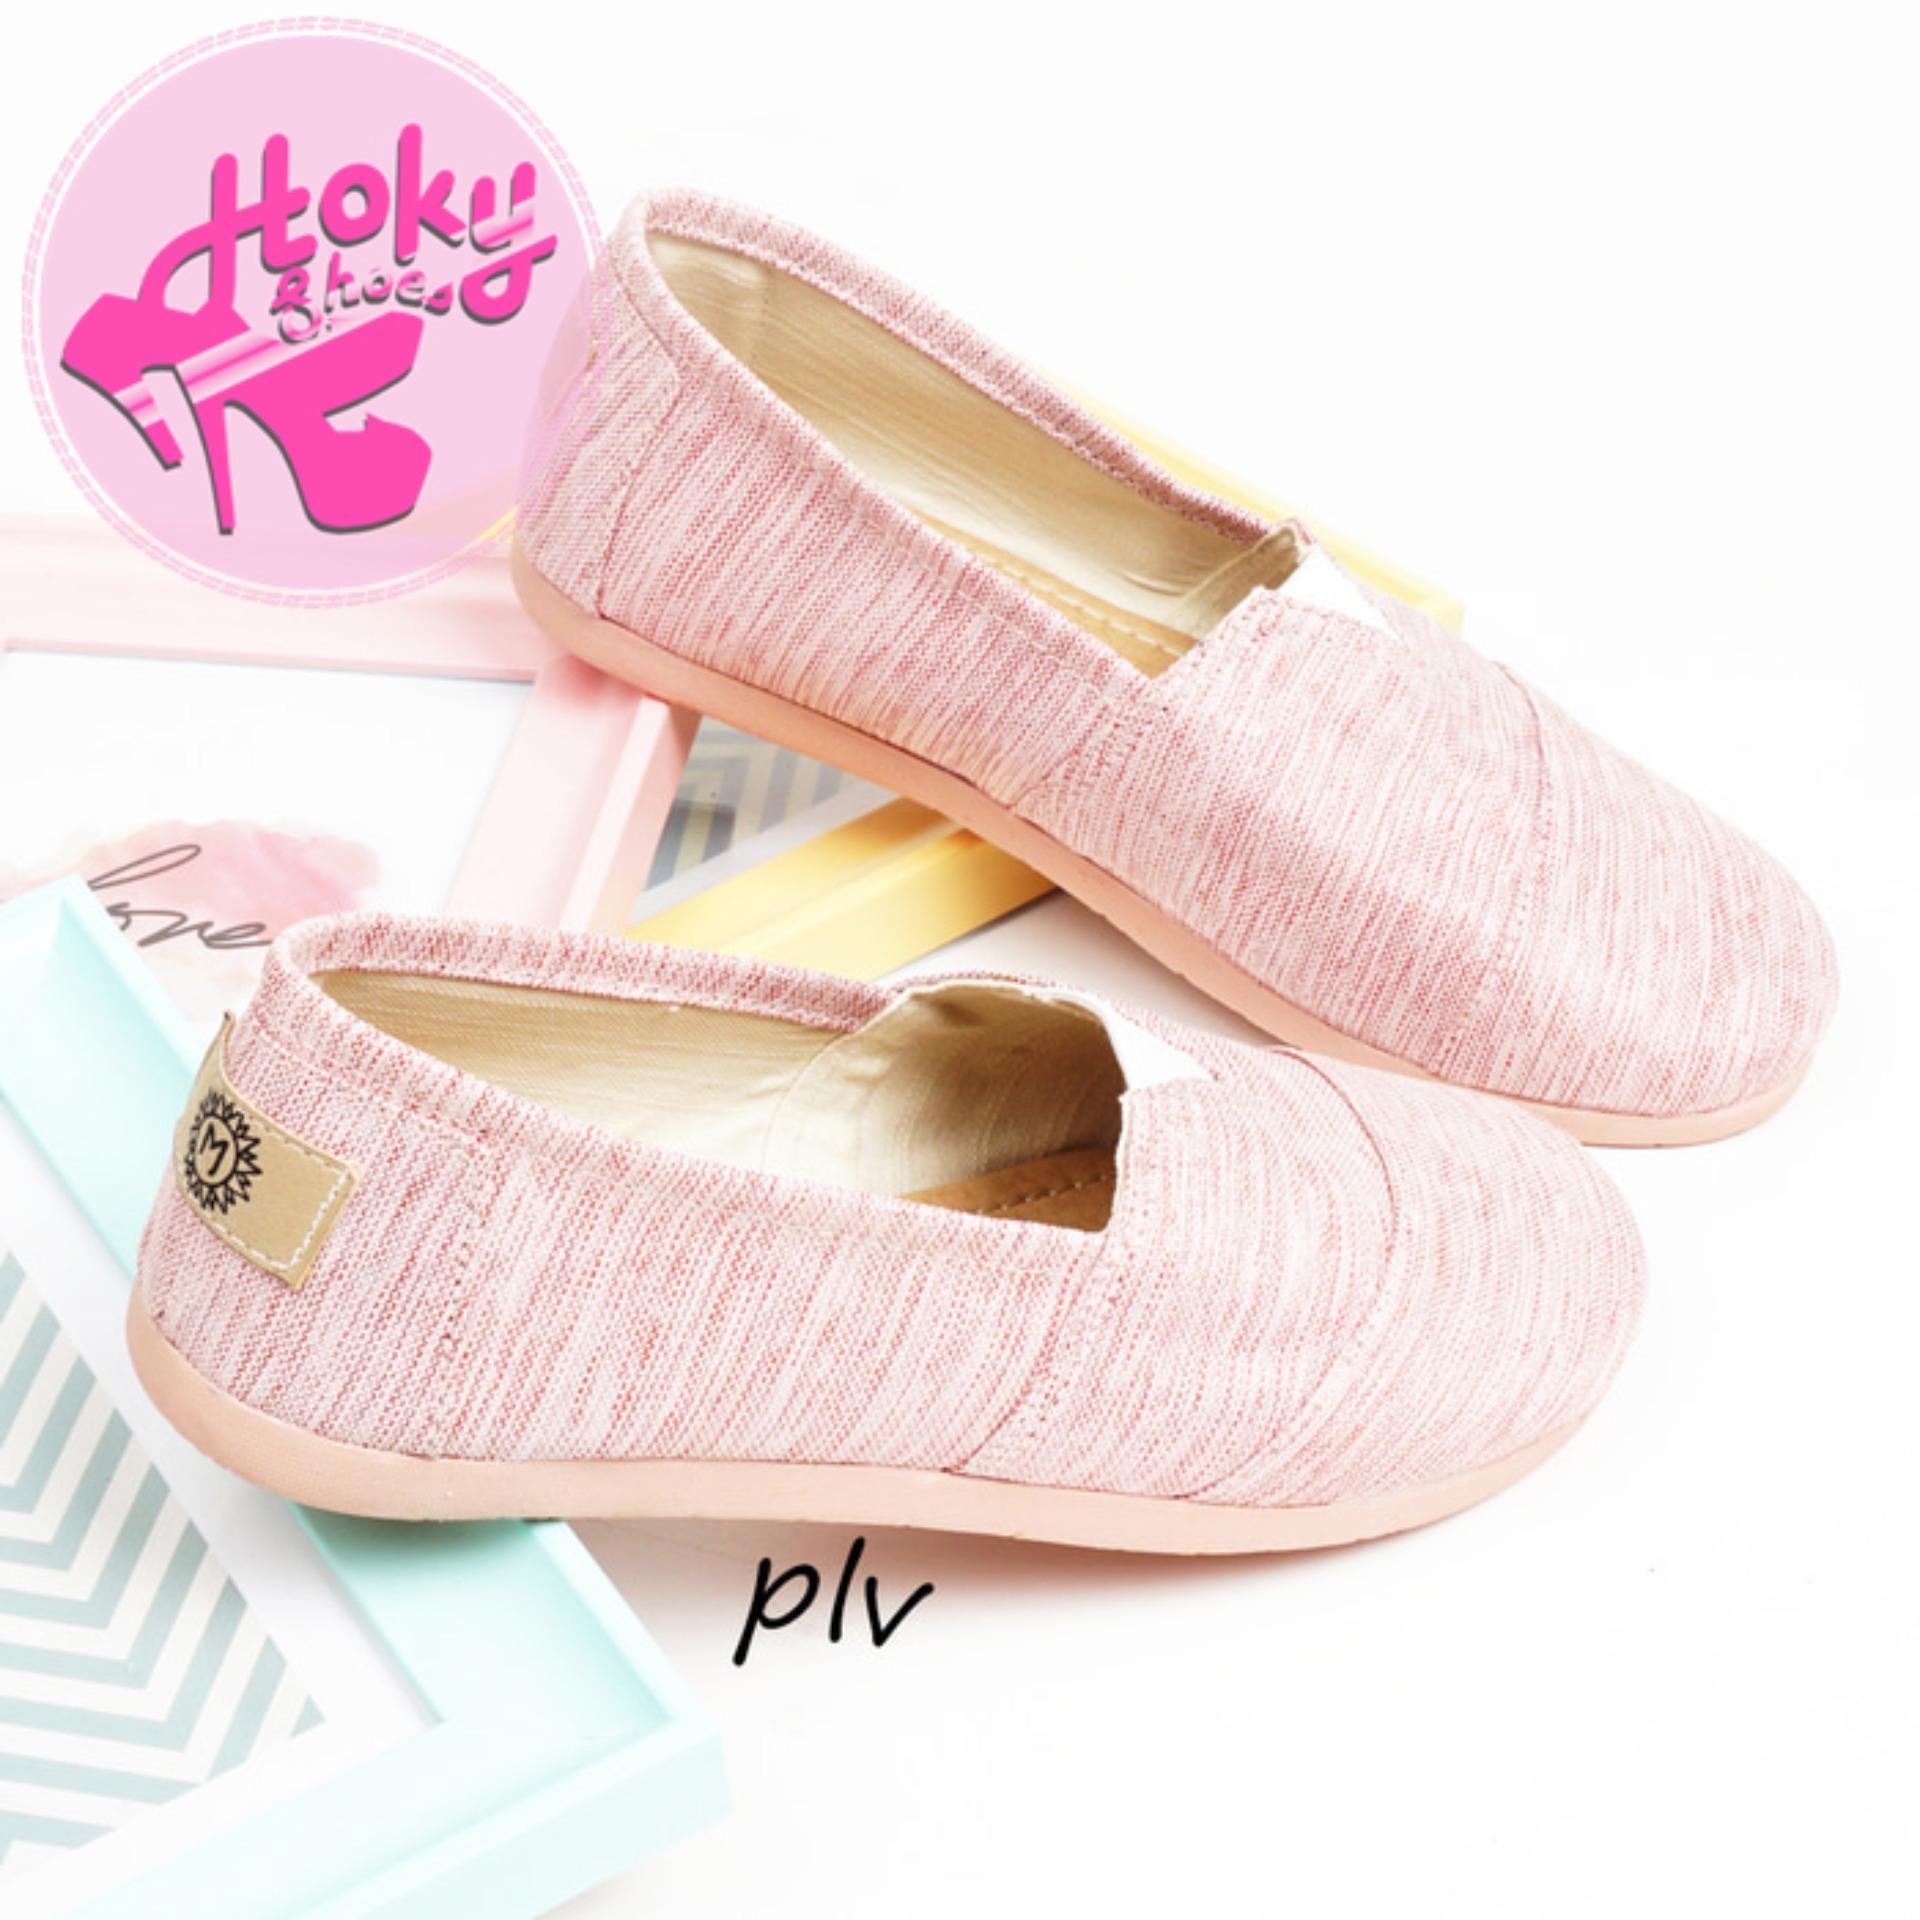 Sepatu Flat Shoes Flatshoes Murah Ala Wakai Ns55 Navy Update Mikkusu Maroon Grey Black Slip On Wak0002551zz895 Hitam 36 Wanita Kanvas Hs55 Abu